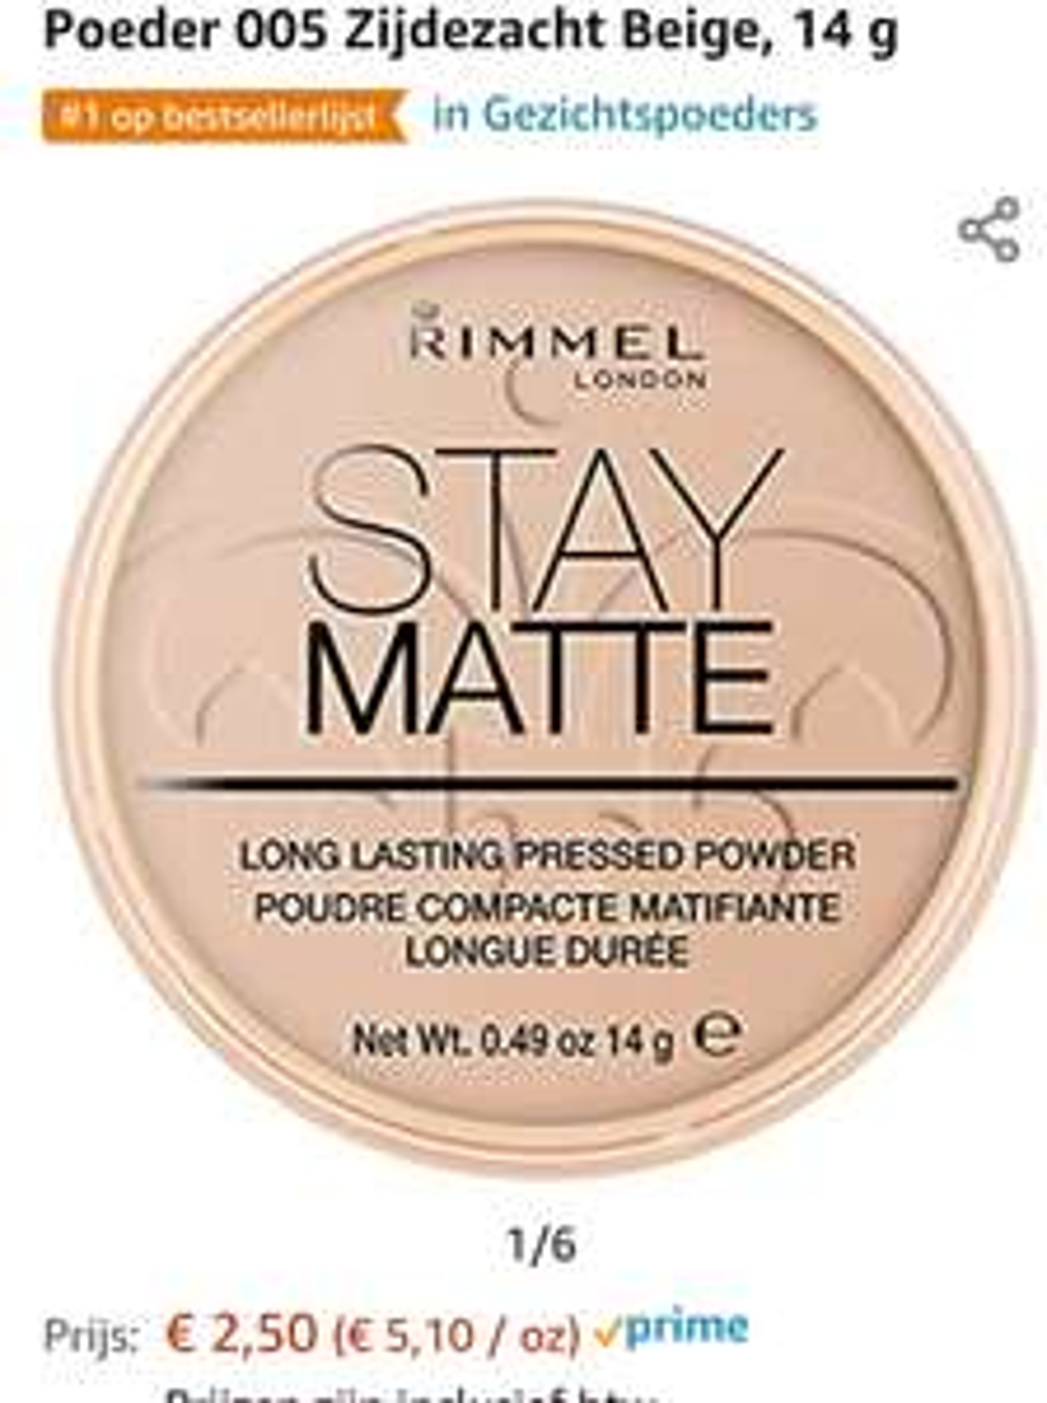 Rimmel London stay matte powder nummer 5